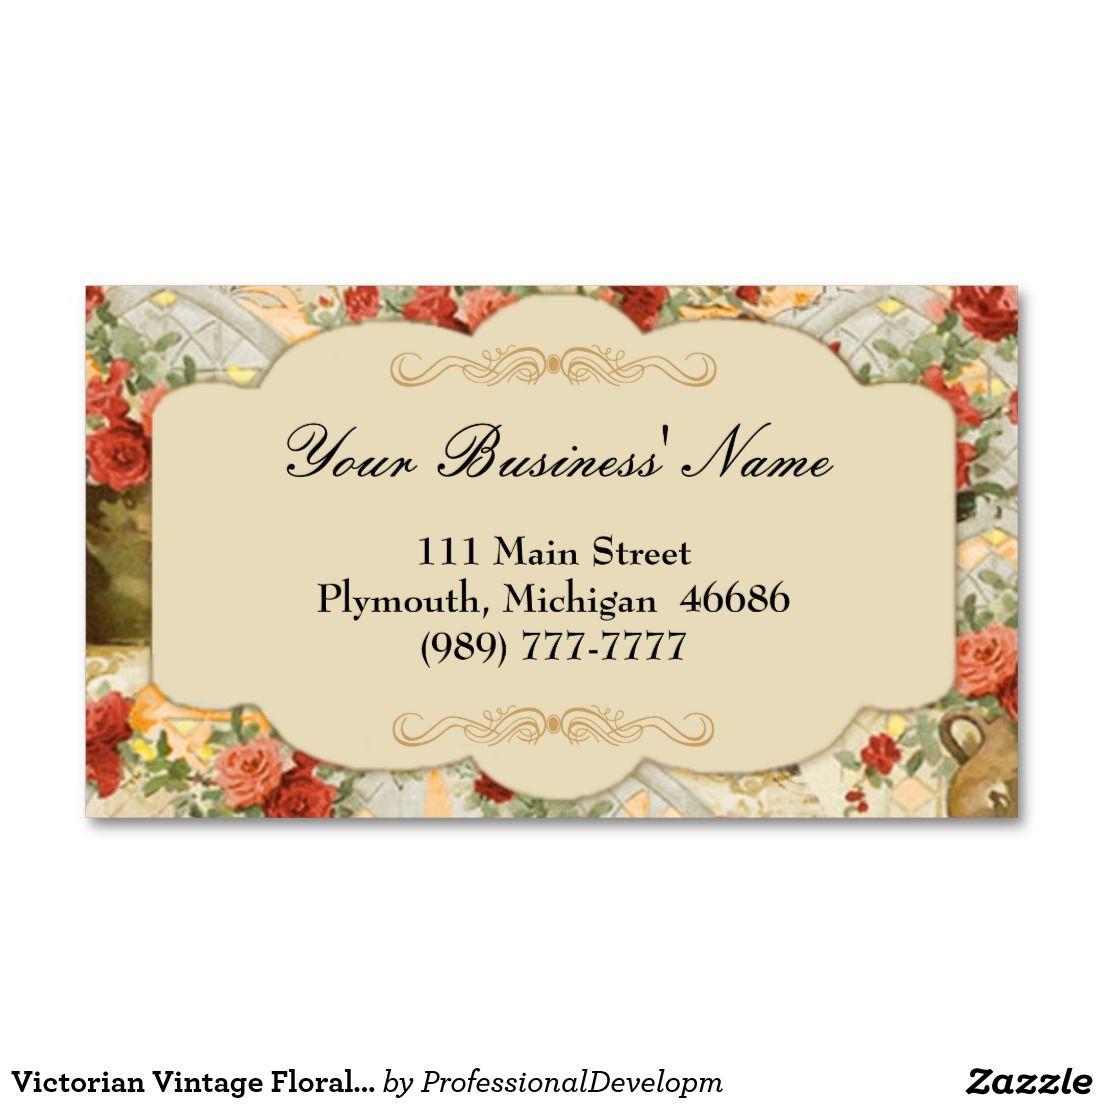 Victorian Vintage Floral Business Card Zazzle Com Floral Business Cards Vintage Floral Business Cards